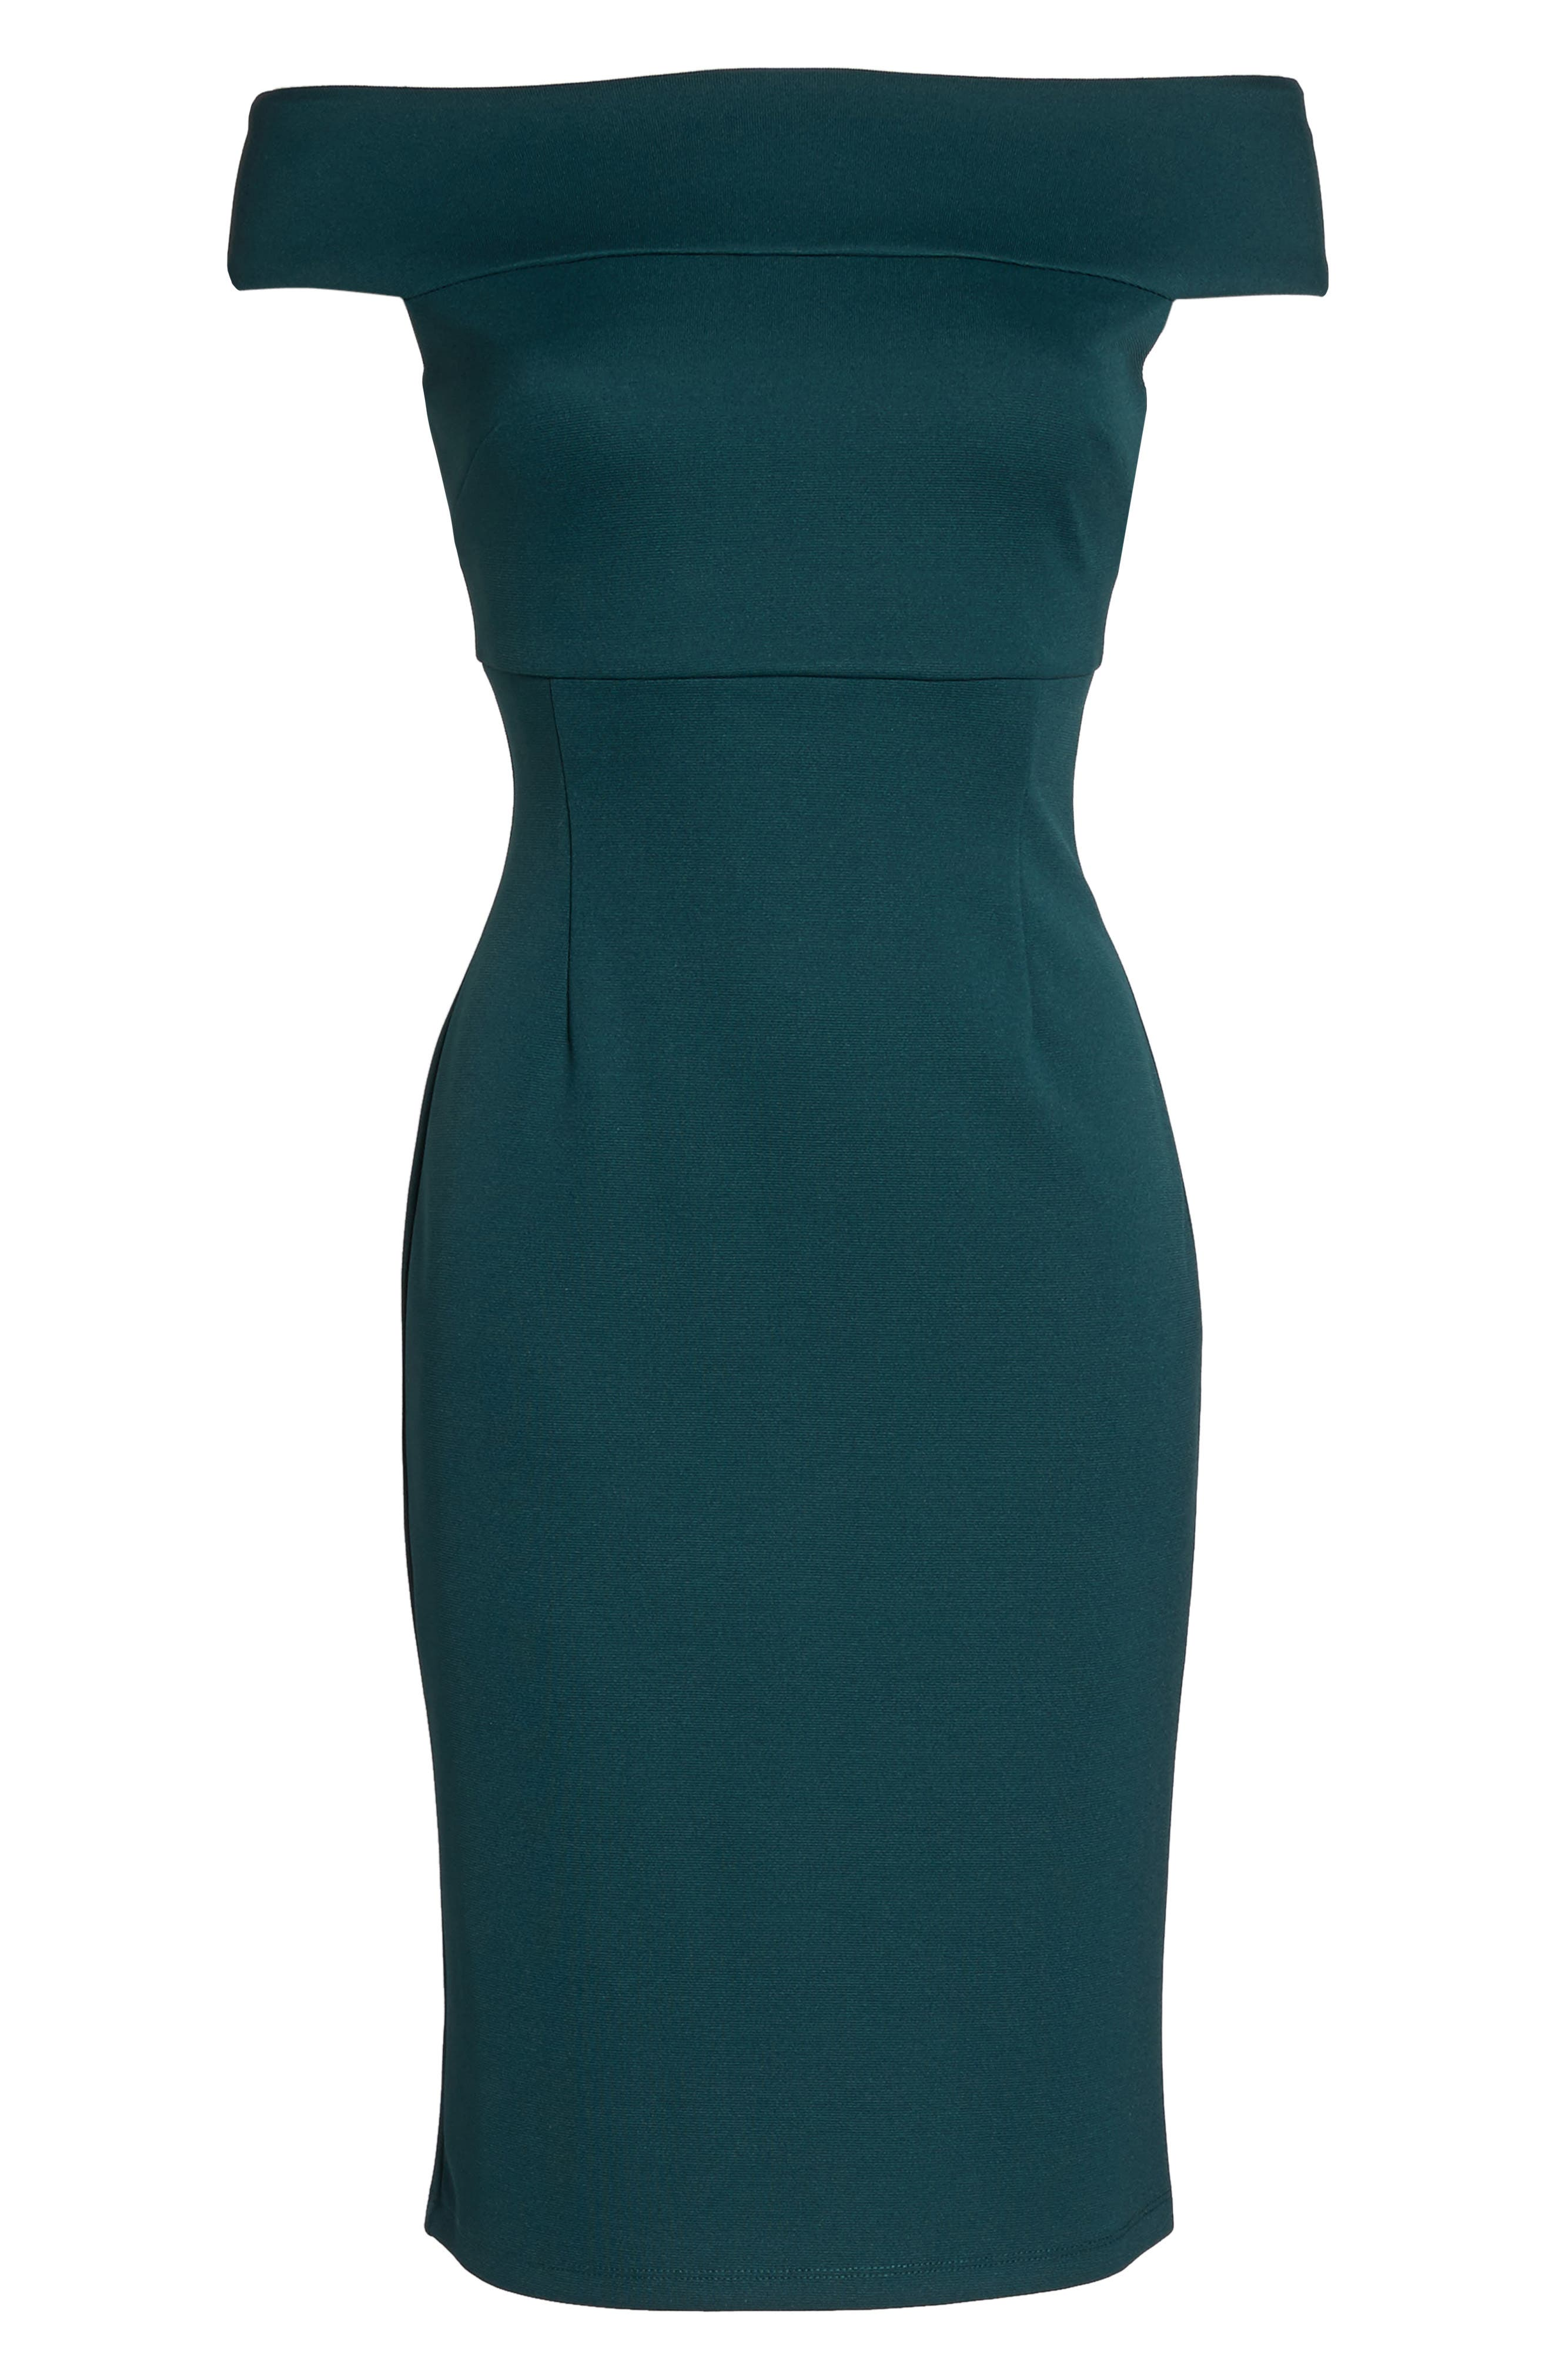 Sheath Dress,                             Alternate thumbnail 6, color,                             303